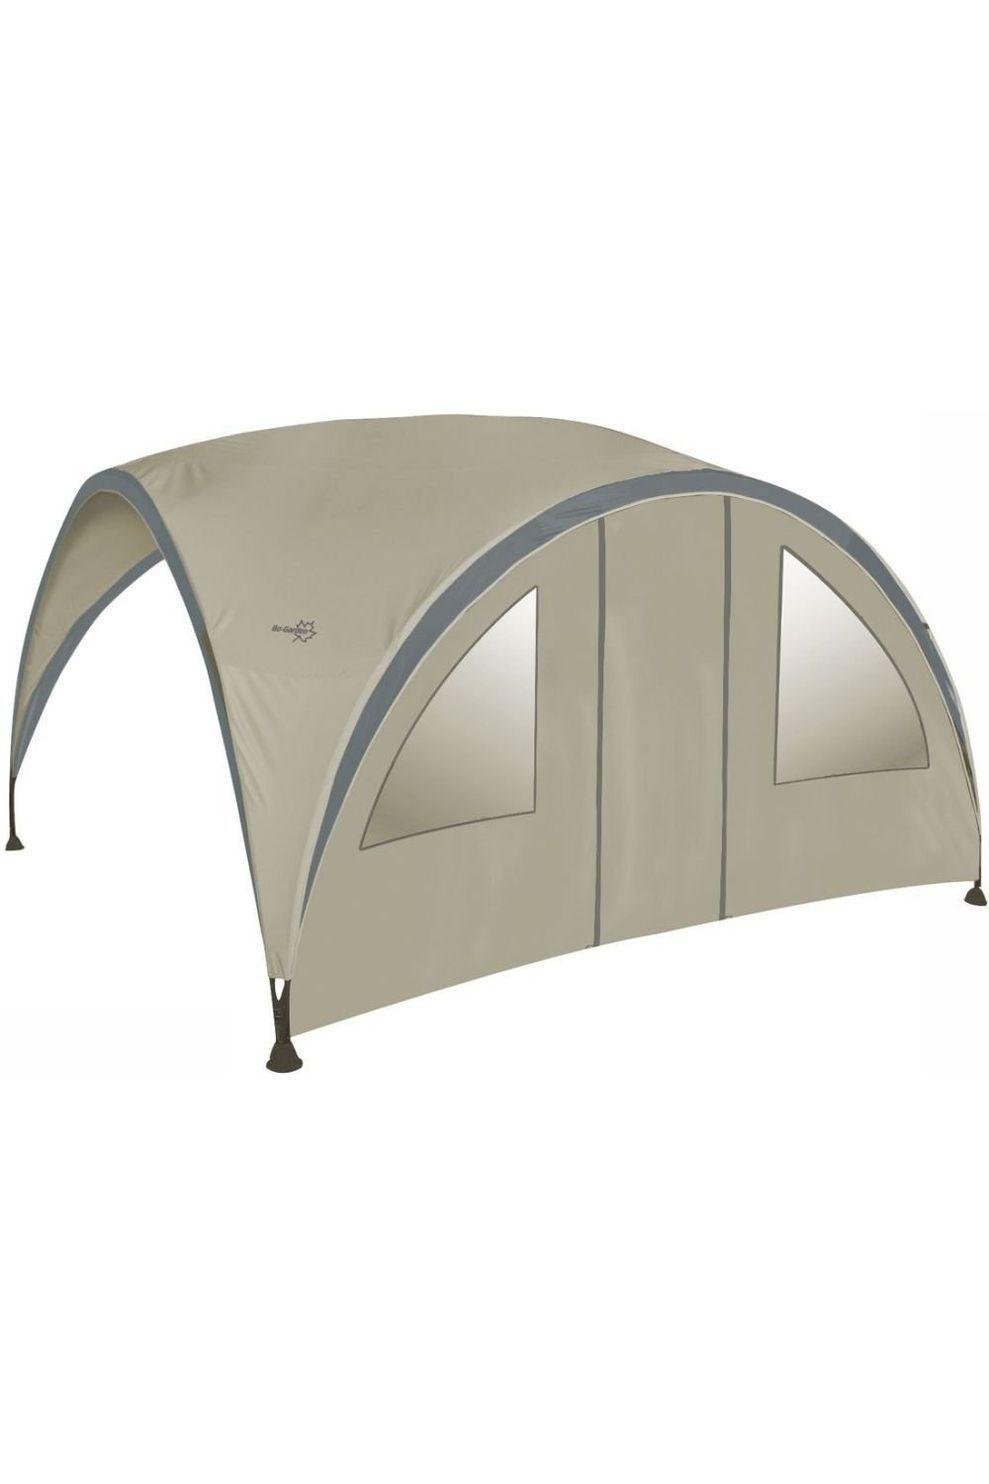 Bo-Garden Tarps Zijwand Voor Party Shelter Small - - Transparant